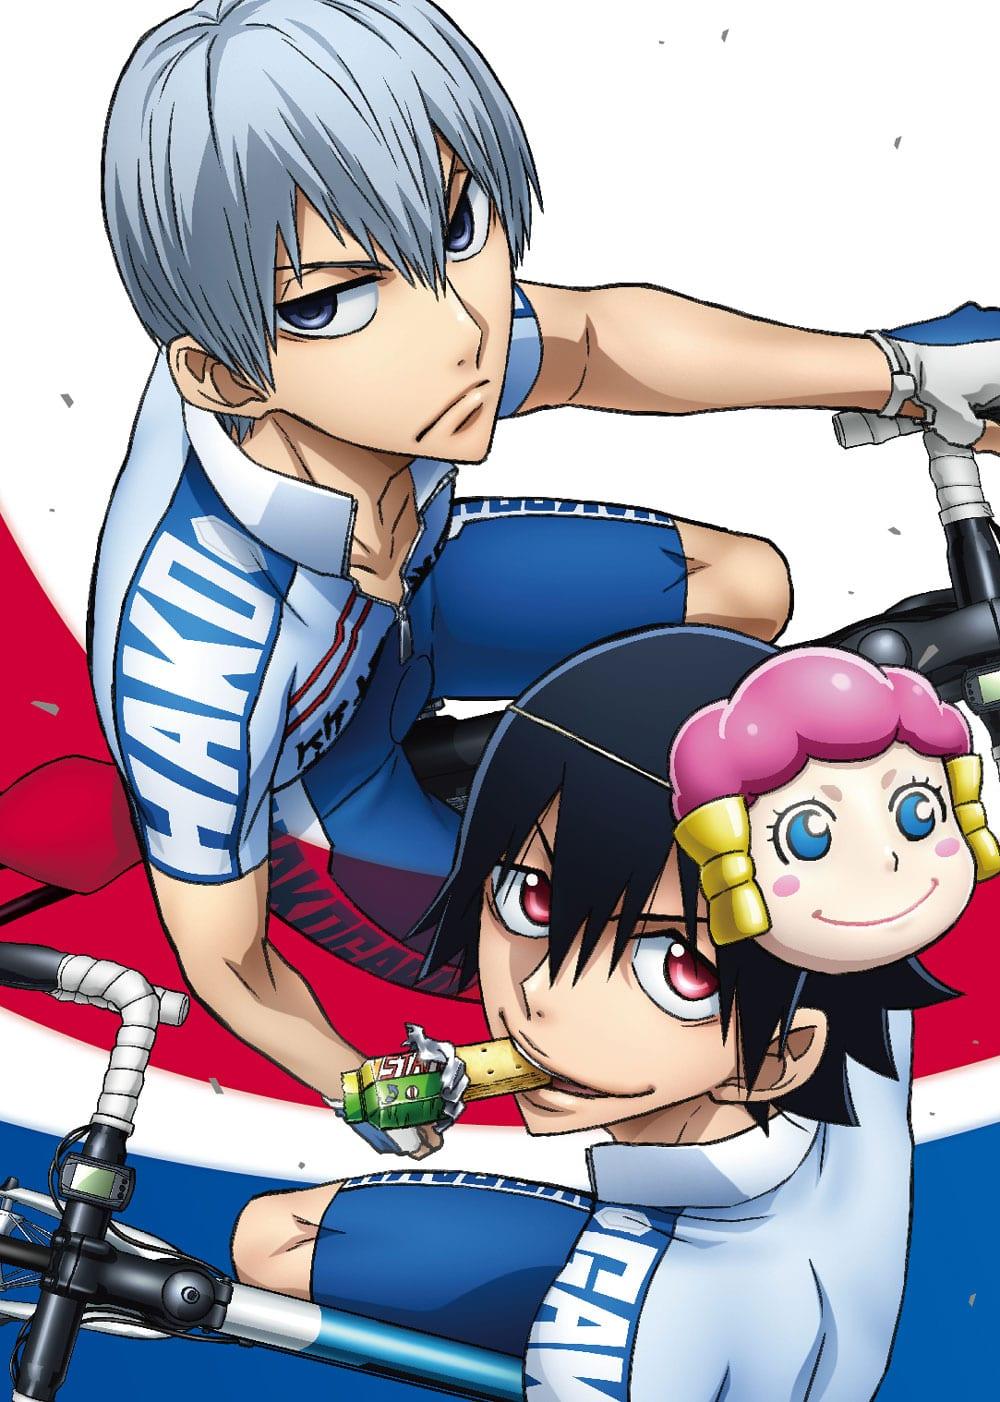 【TOHO animation STORE 限定版】弱虫ペダル NEW GENERATION Vol.7 DVD 初回限定版+ちびキャラ缶バッジセット